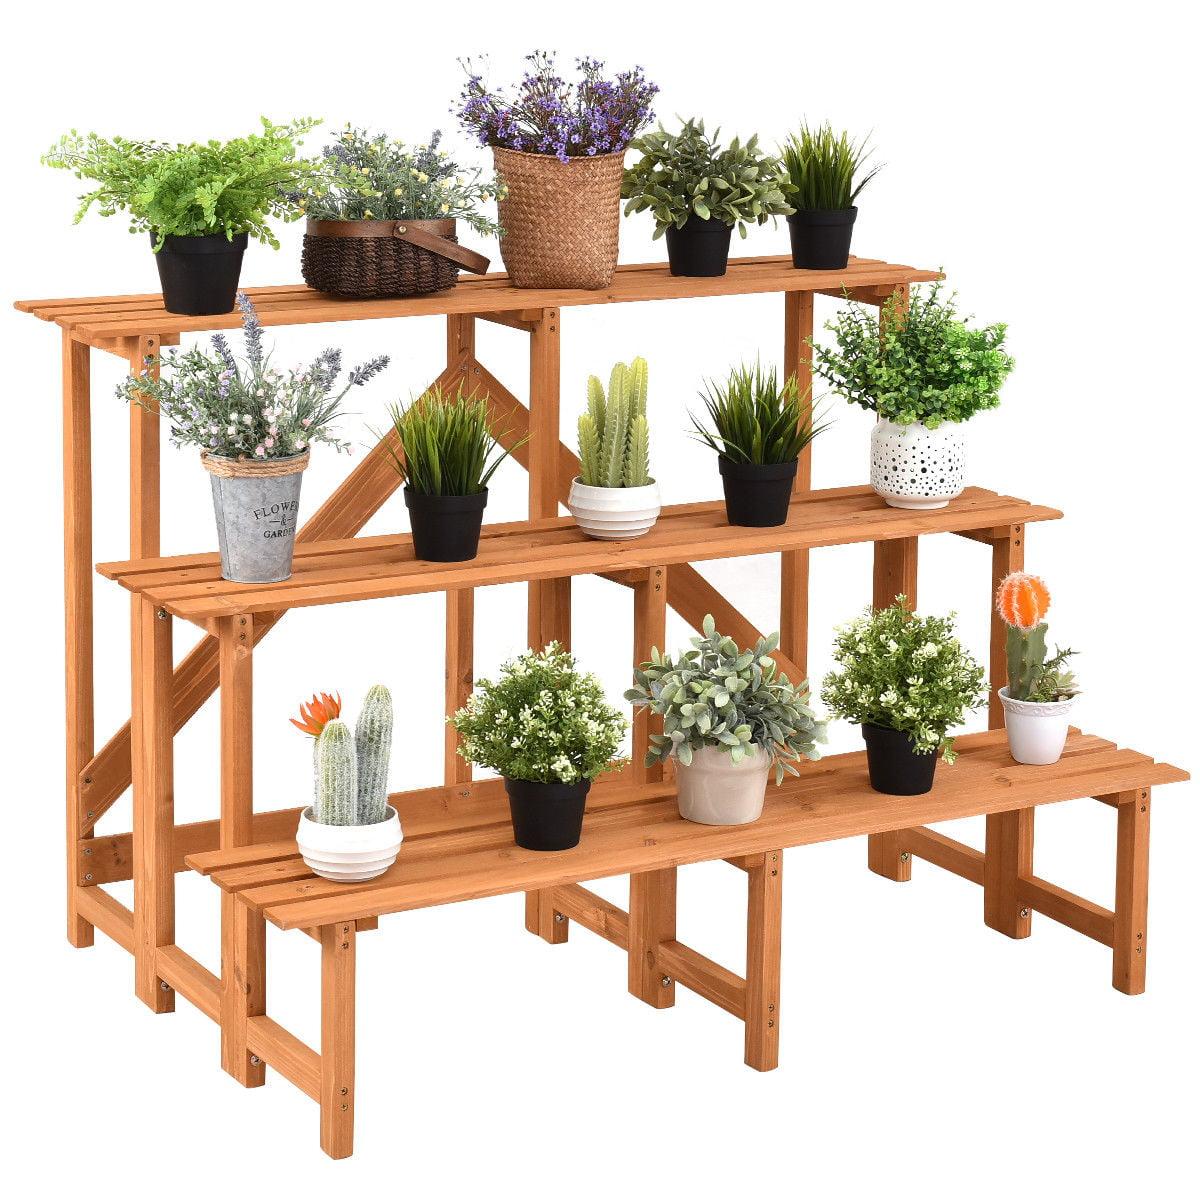 Costway 3 Tier Wide Wood Plant Stand Flower Pot Holder Display Rack Shelves Step Ladder Walmart Com Walmart Com